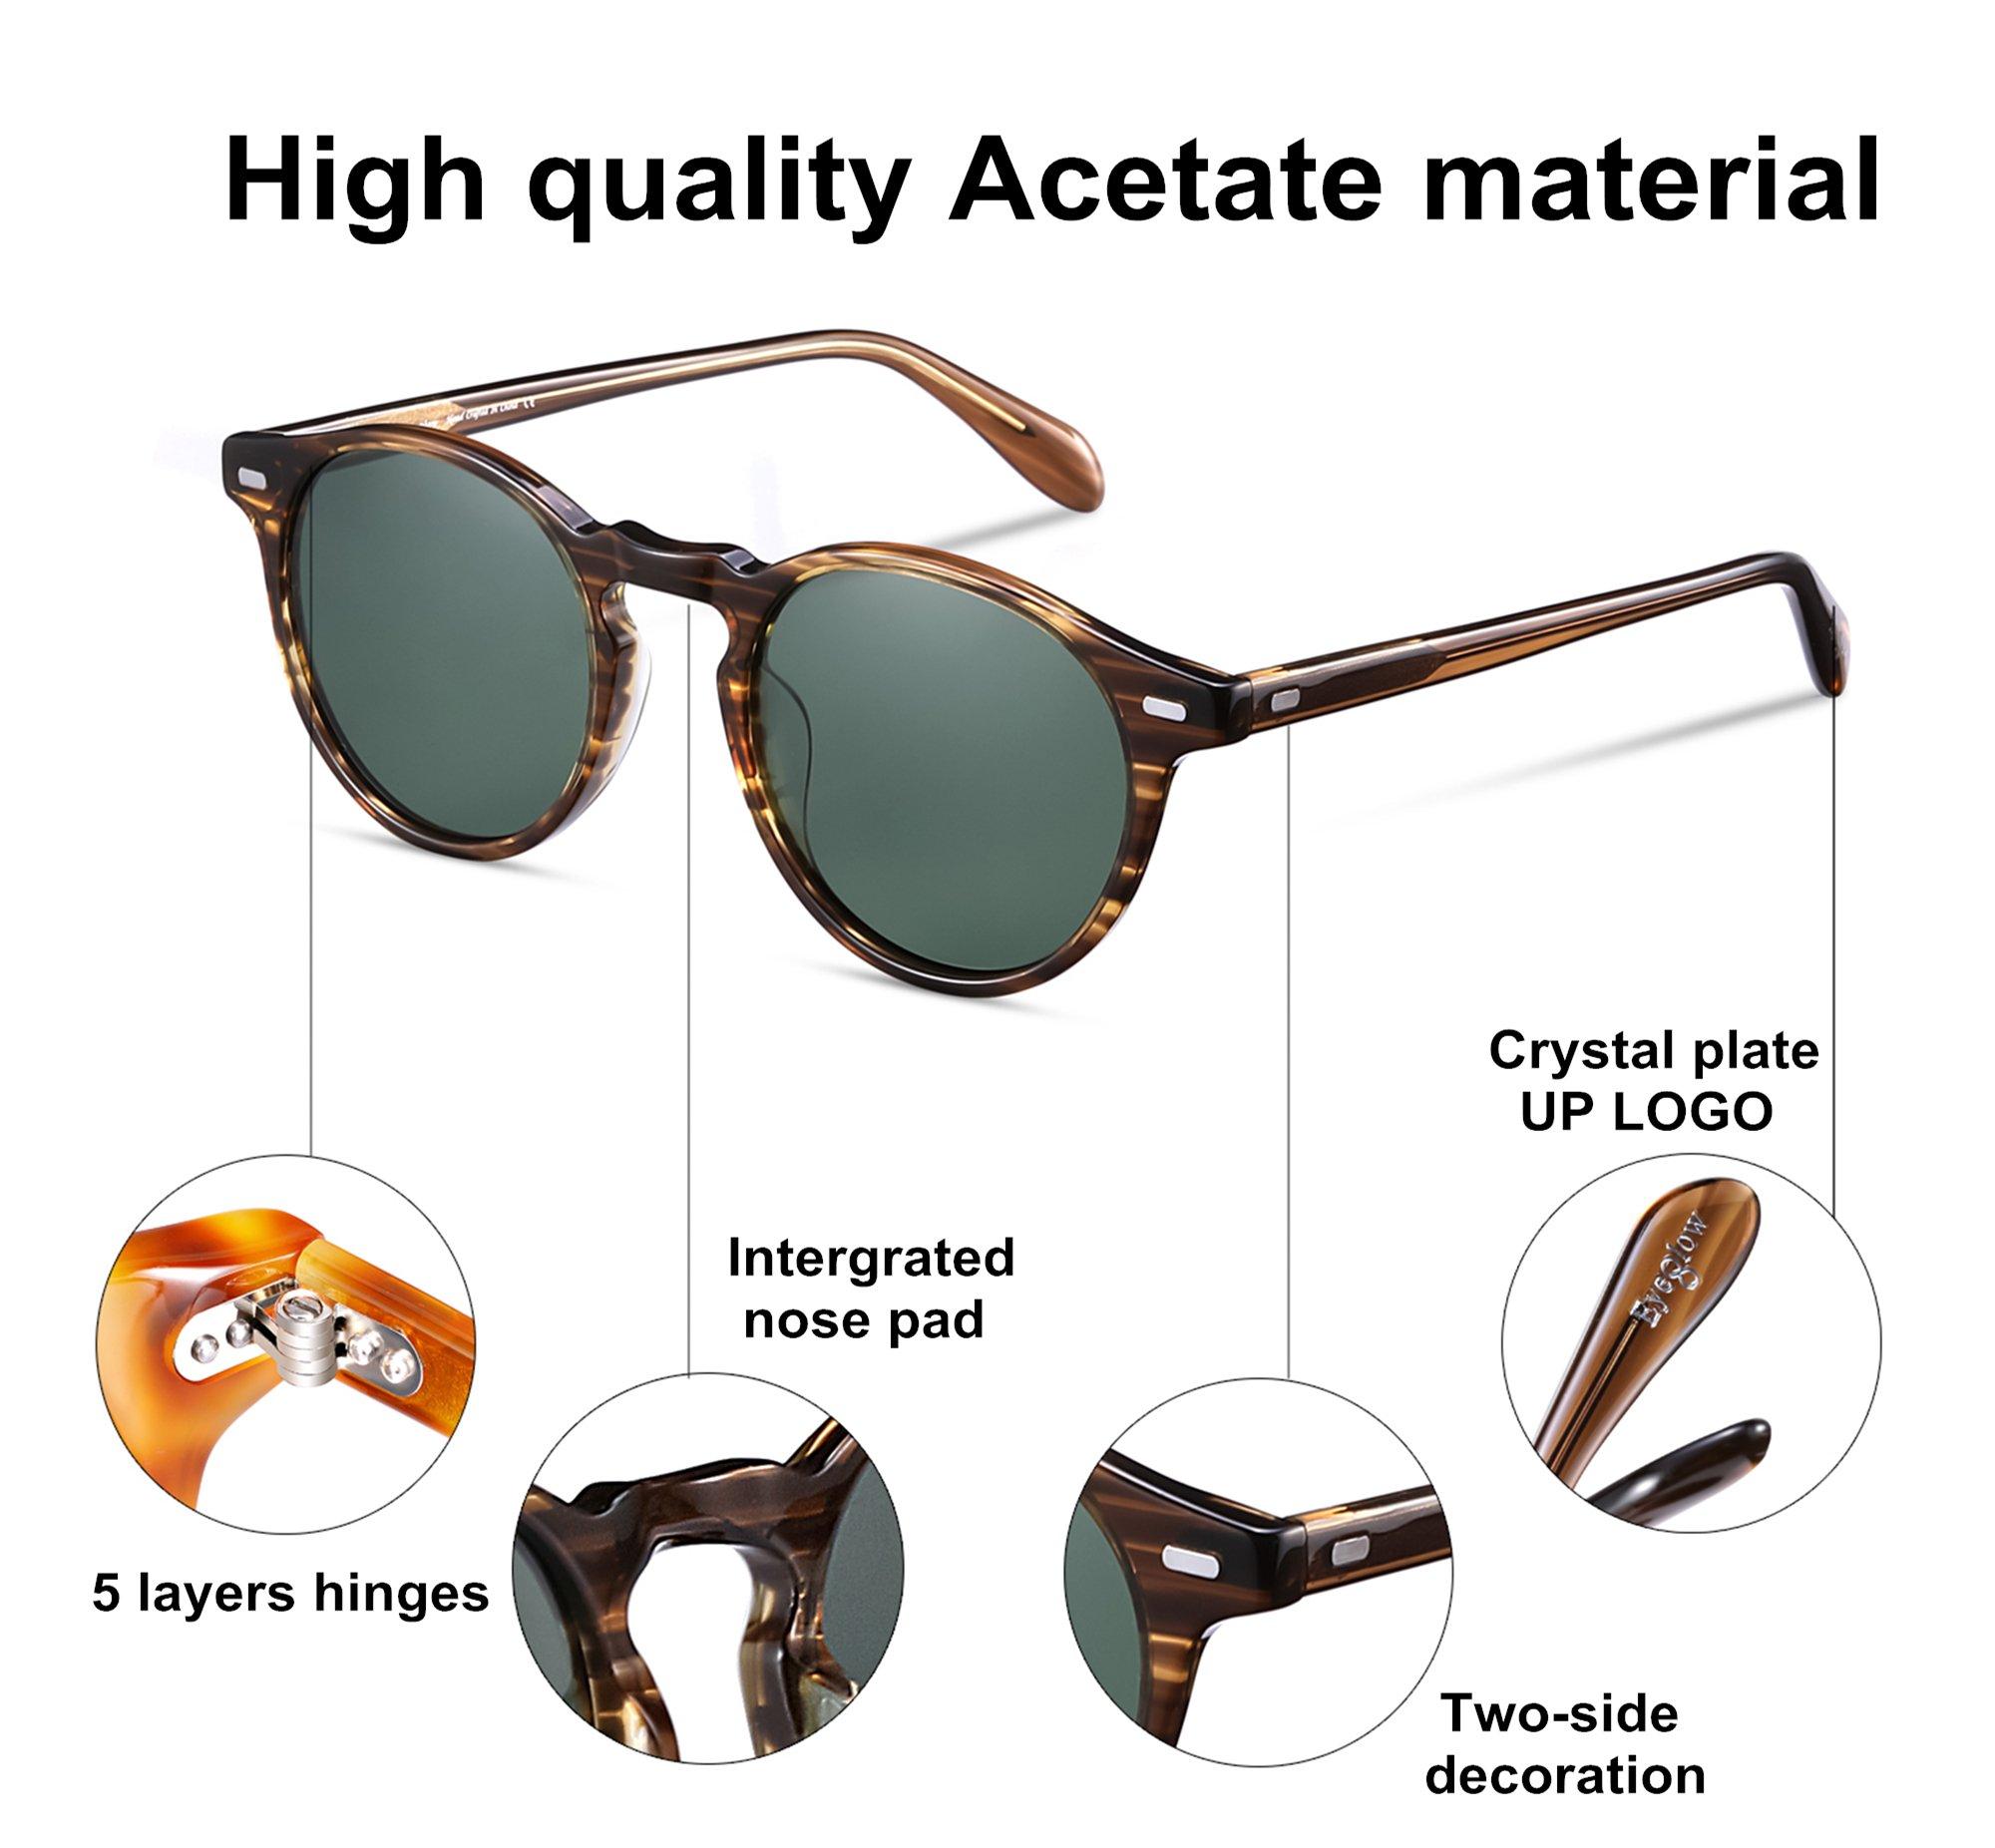 EyeGlow Vintage Round Sunglasses Women Sunglasses Men Polarized Lens 5187 Acetate material (Blonde vs green polarized lens, As pictures) by EyeGlow (Image #3)